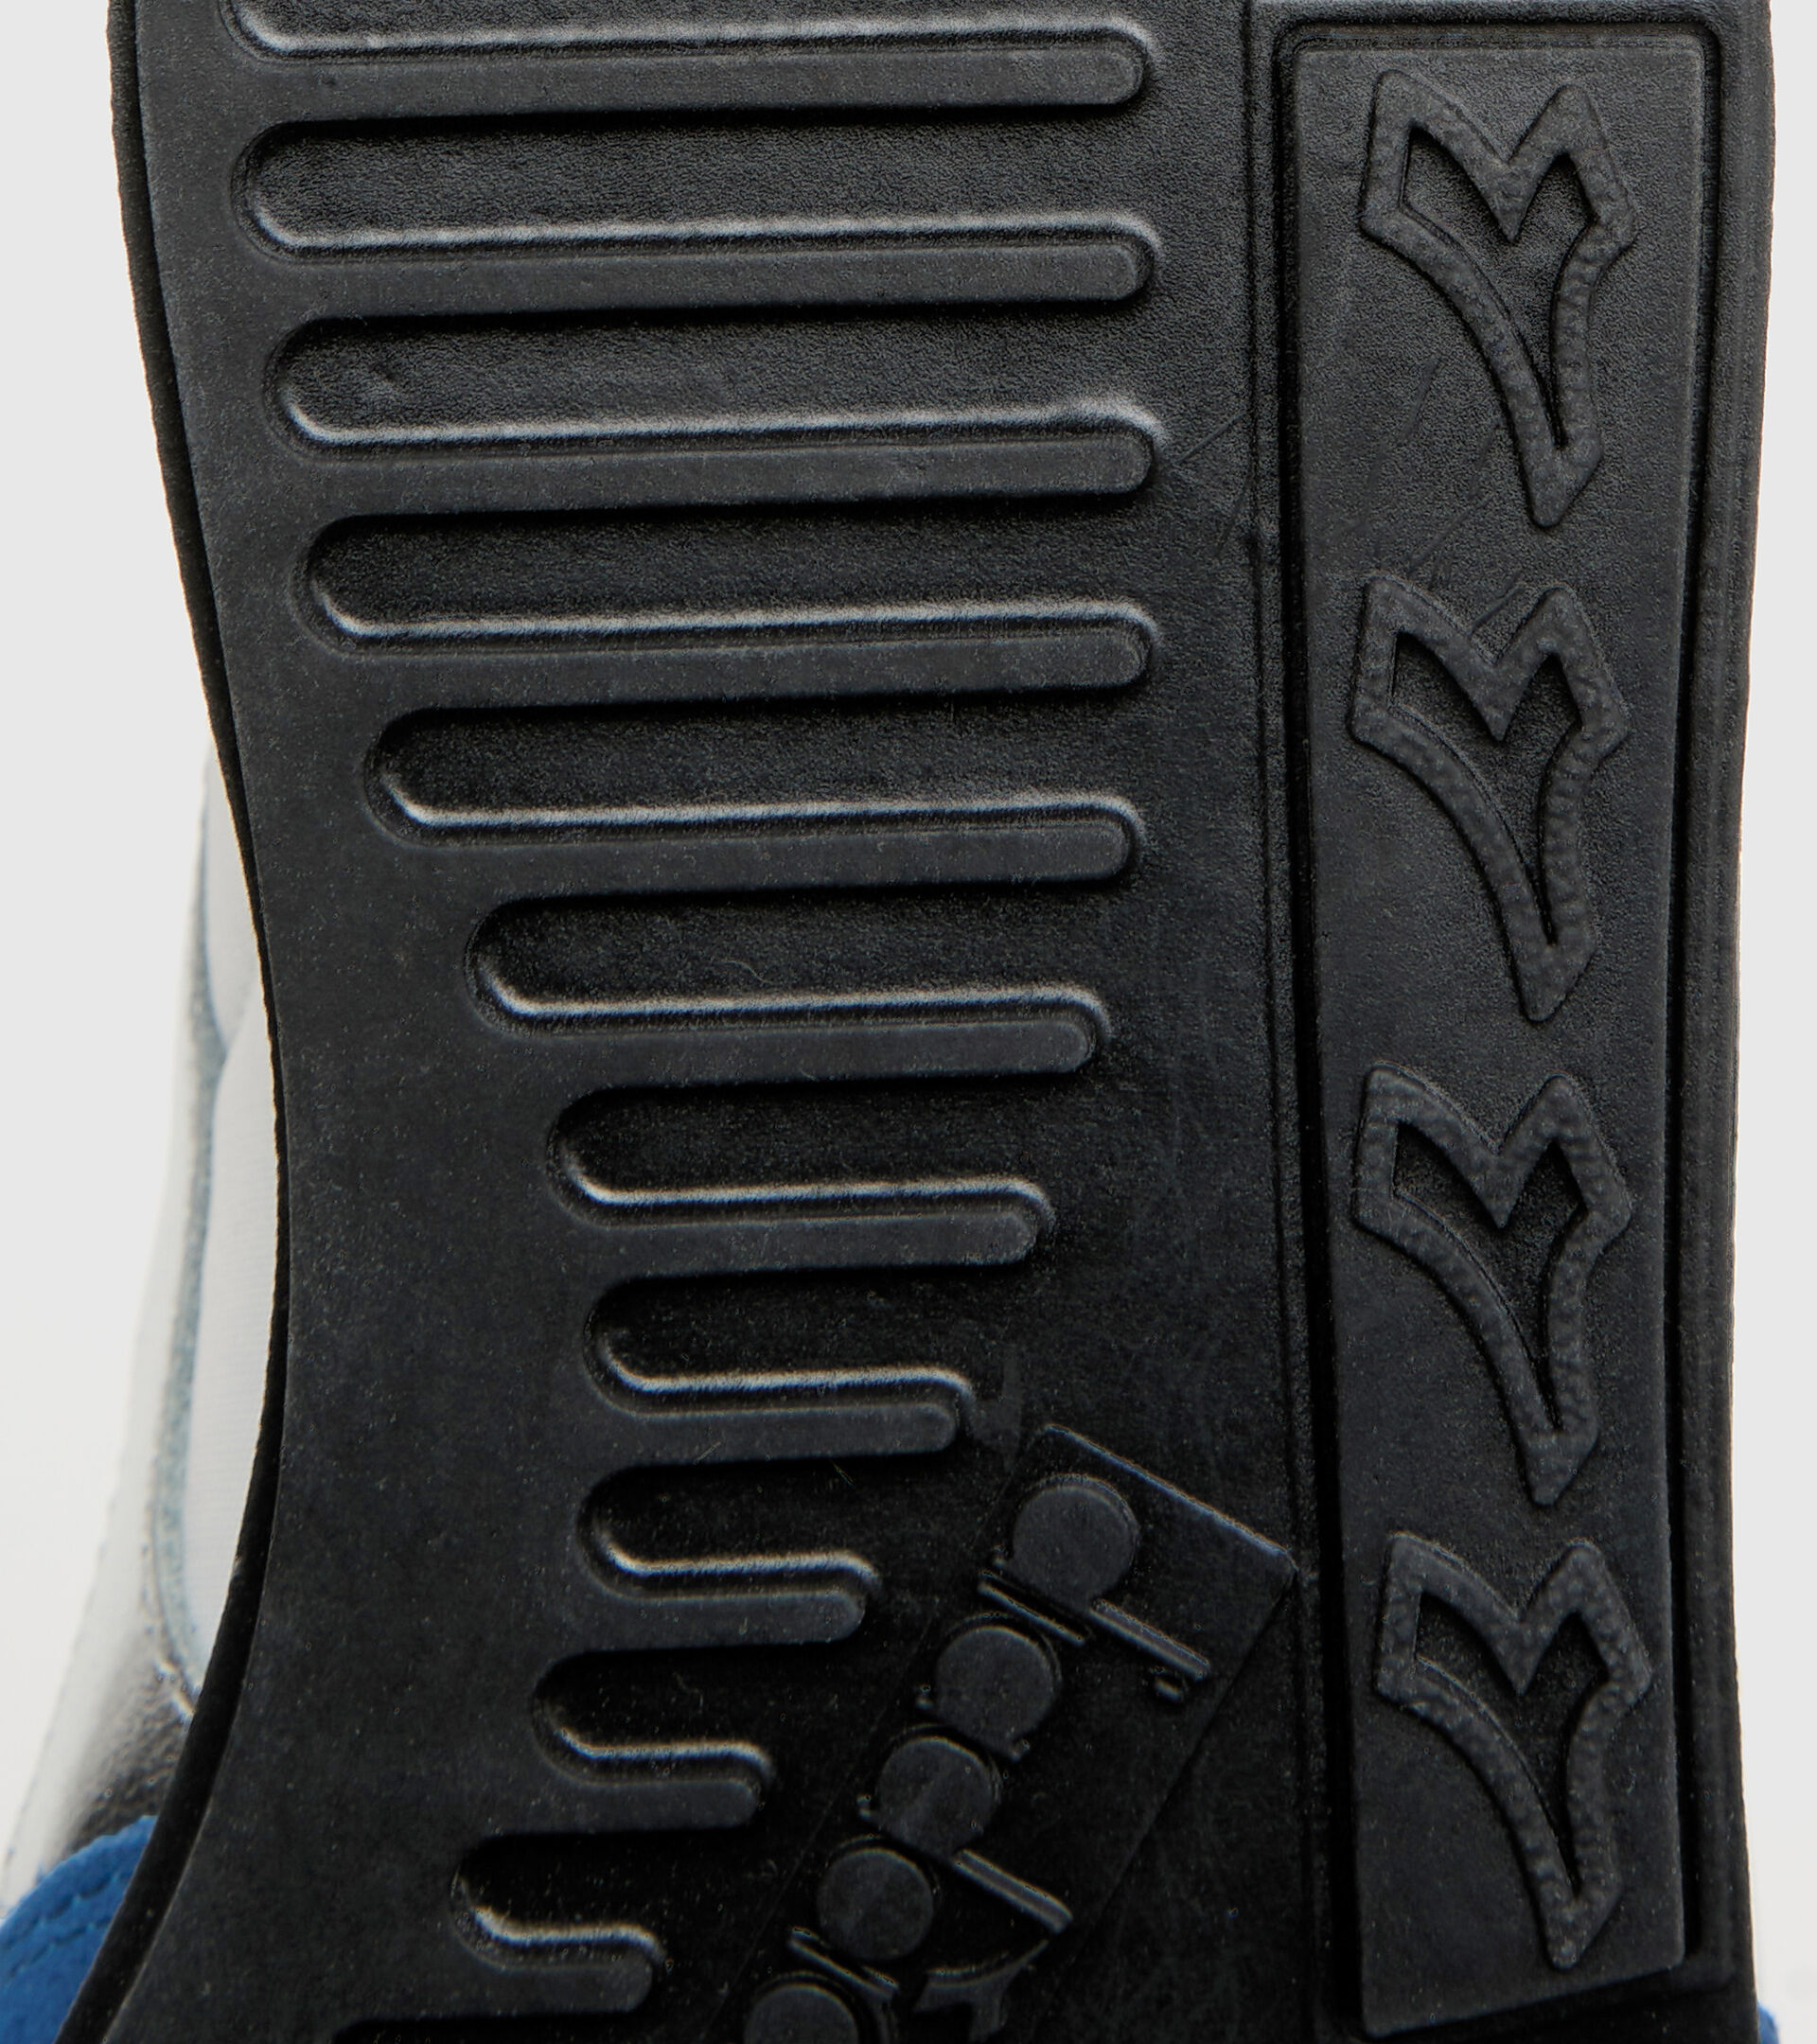 Scarpa sportiva - Unisex CAMARO METAL BIANCO/BLU OLANDESE - Diadora